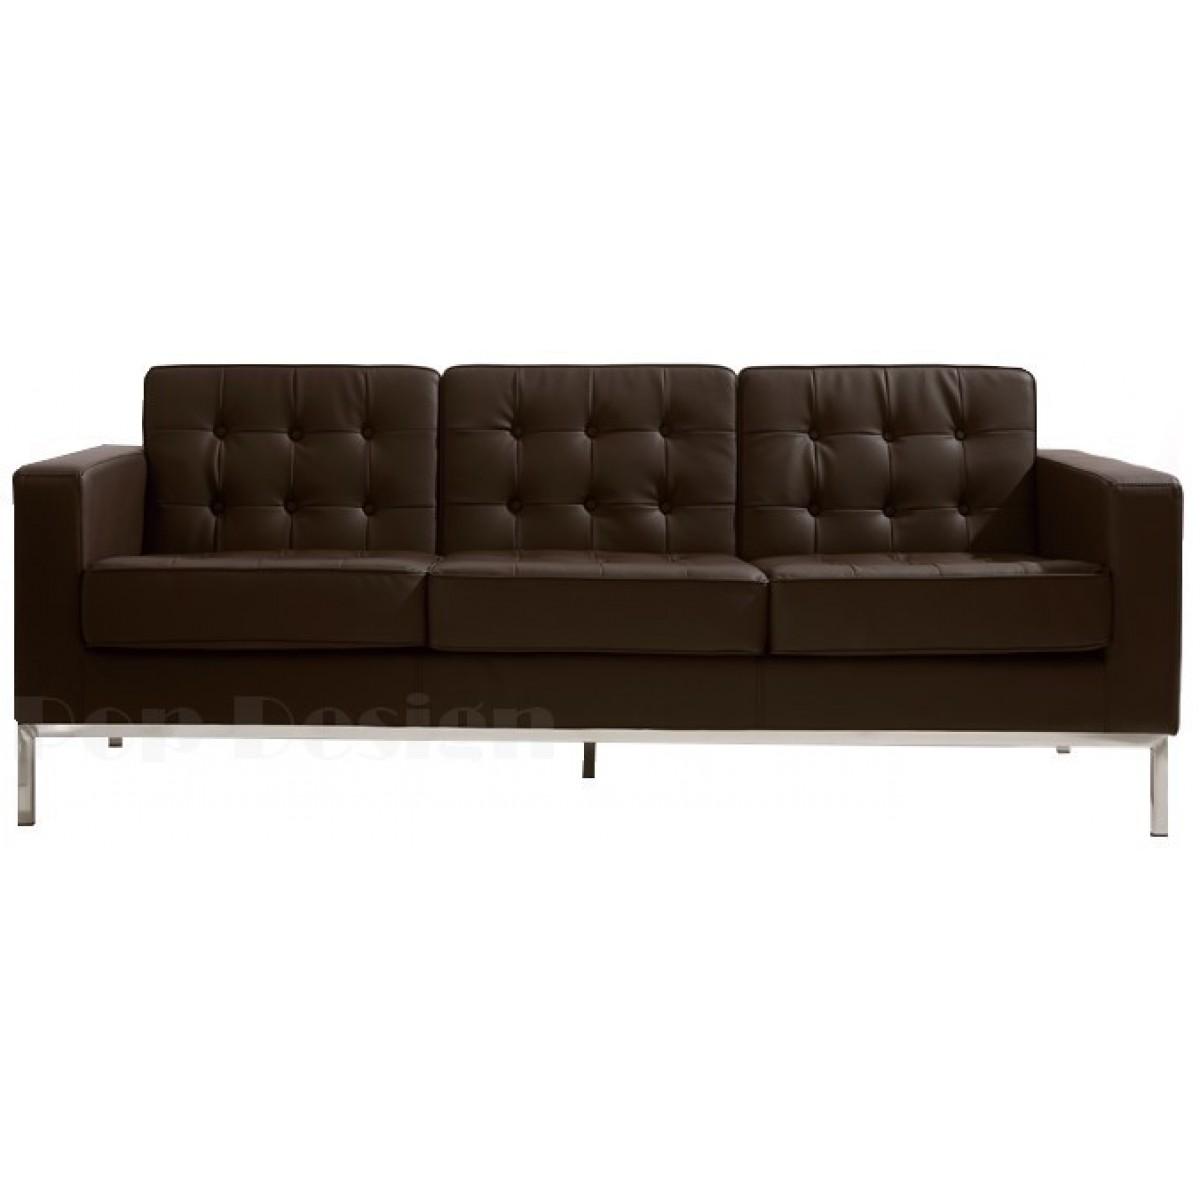 fauteuil canap s en cuir tender. Black Bedroom Furniture Sets. Home Design Ideas